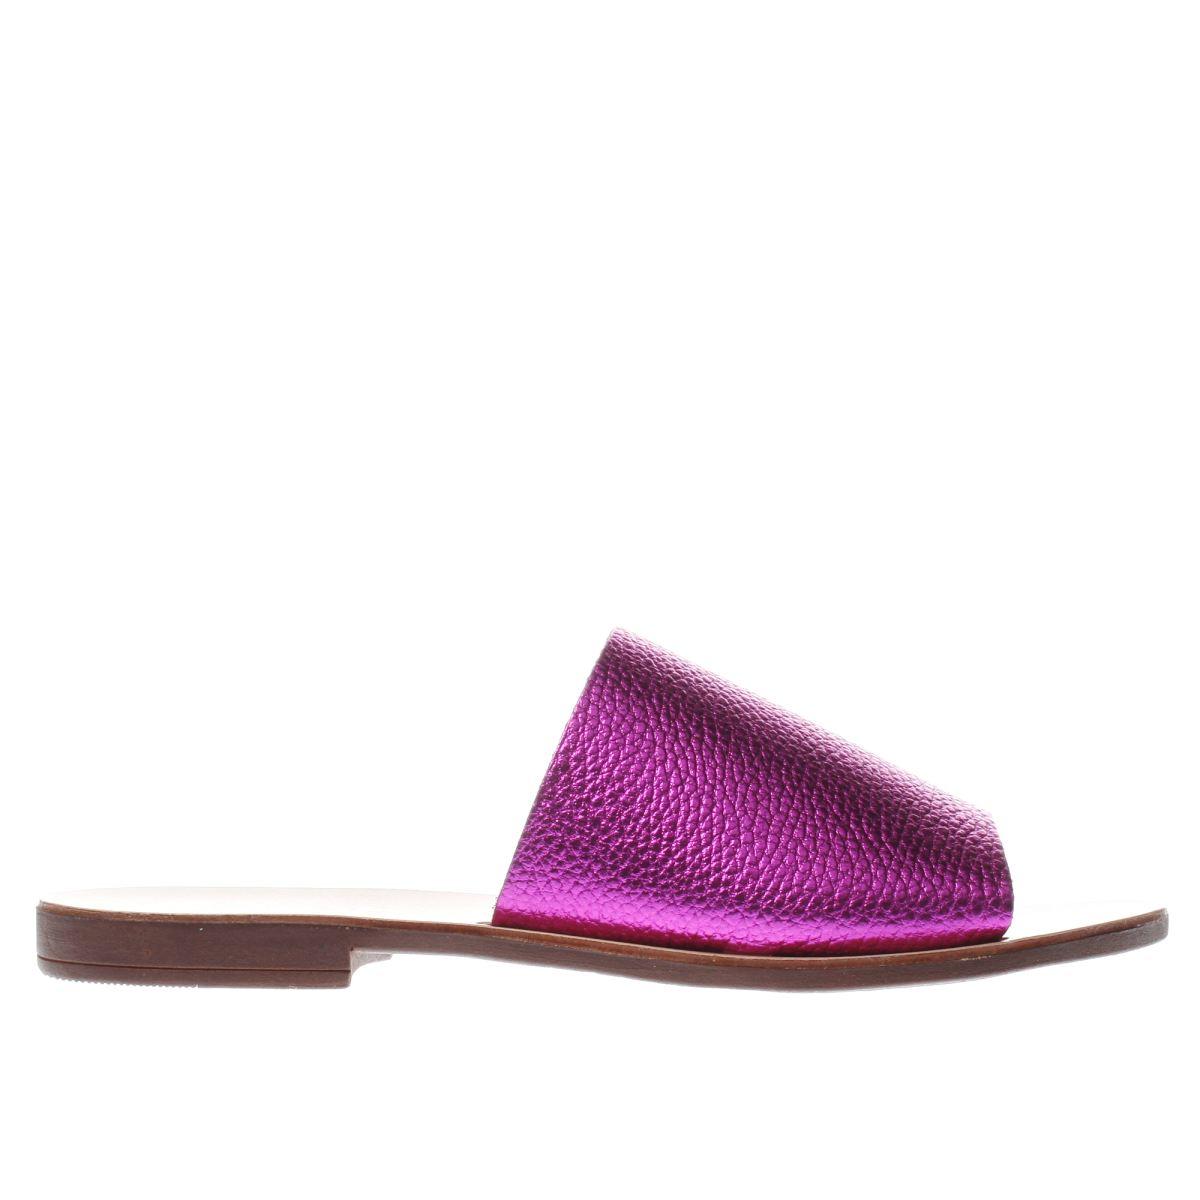 schuh pink bali sandals